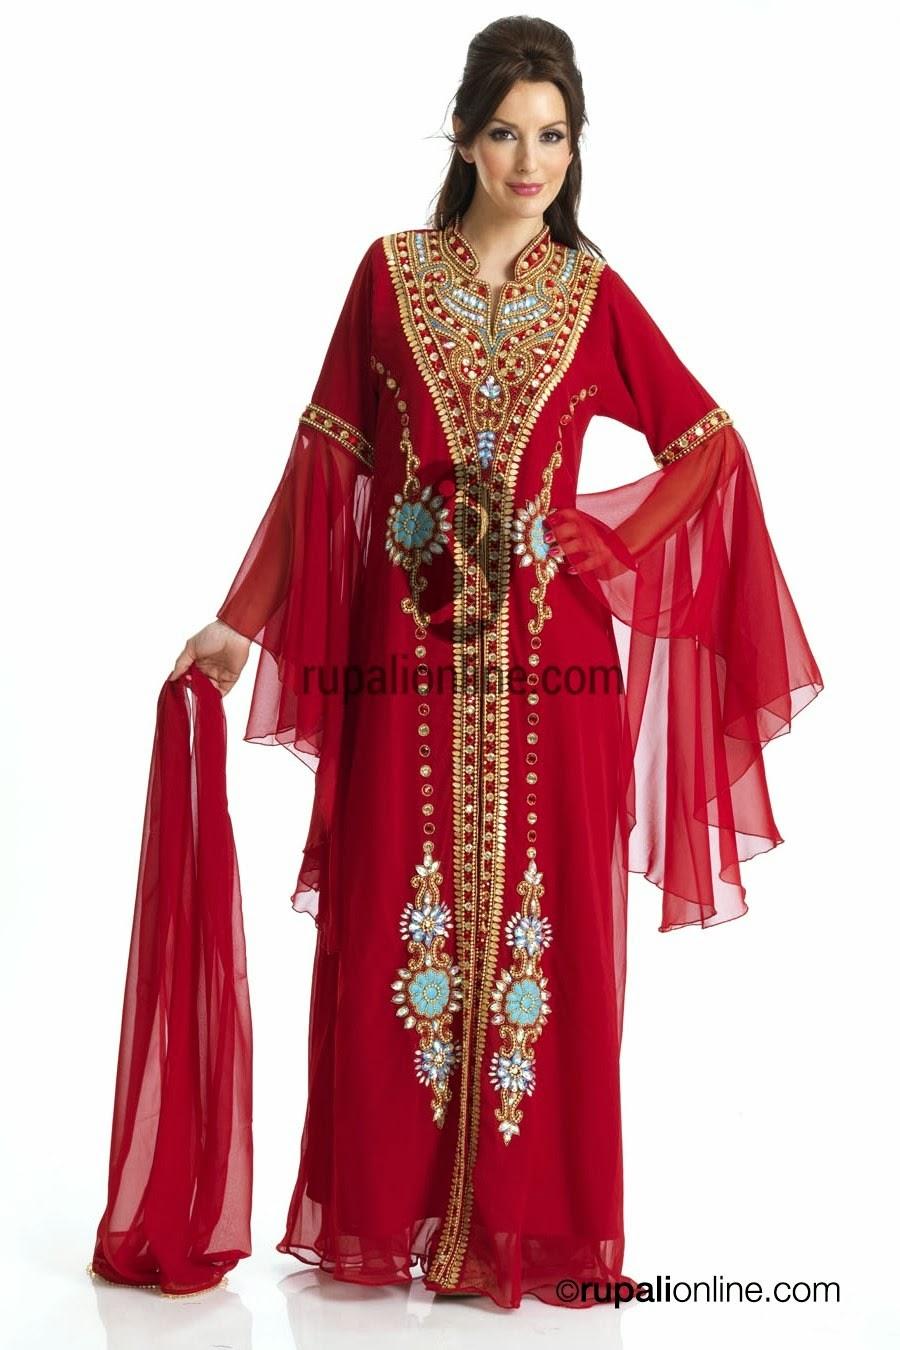 a17afc73d25 Rupali Online New Collection of Farasha   Maxi. Zaal Embroidered Farasha  Collection 2013 14